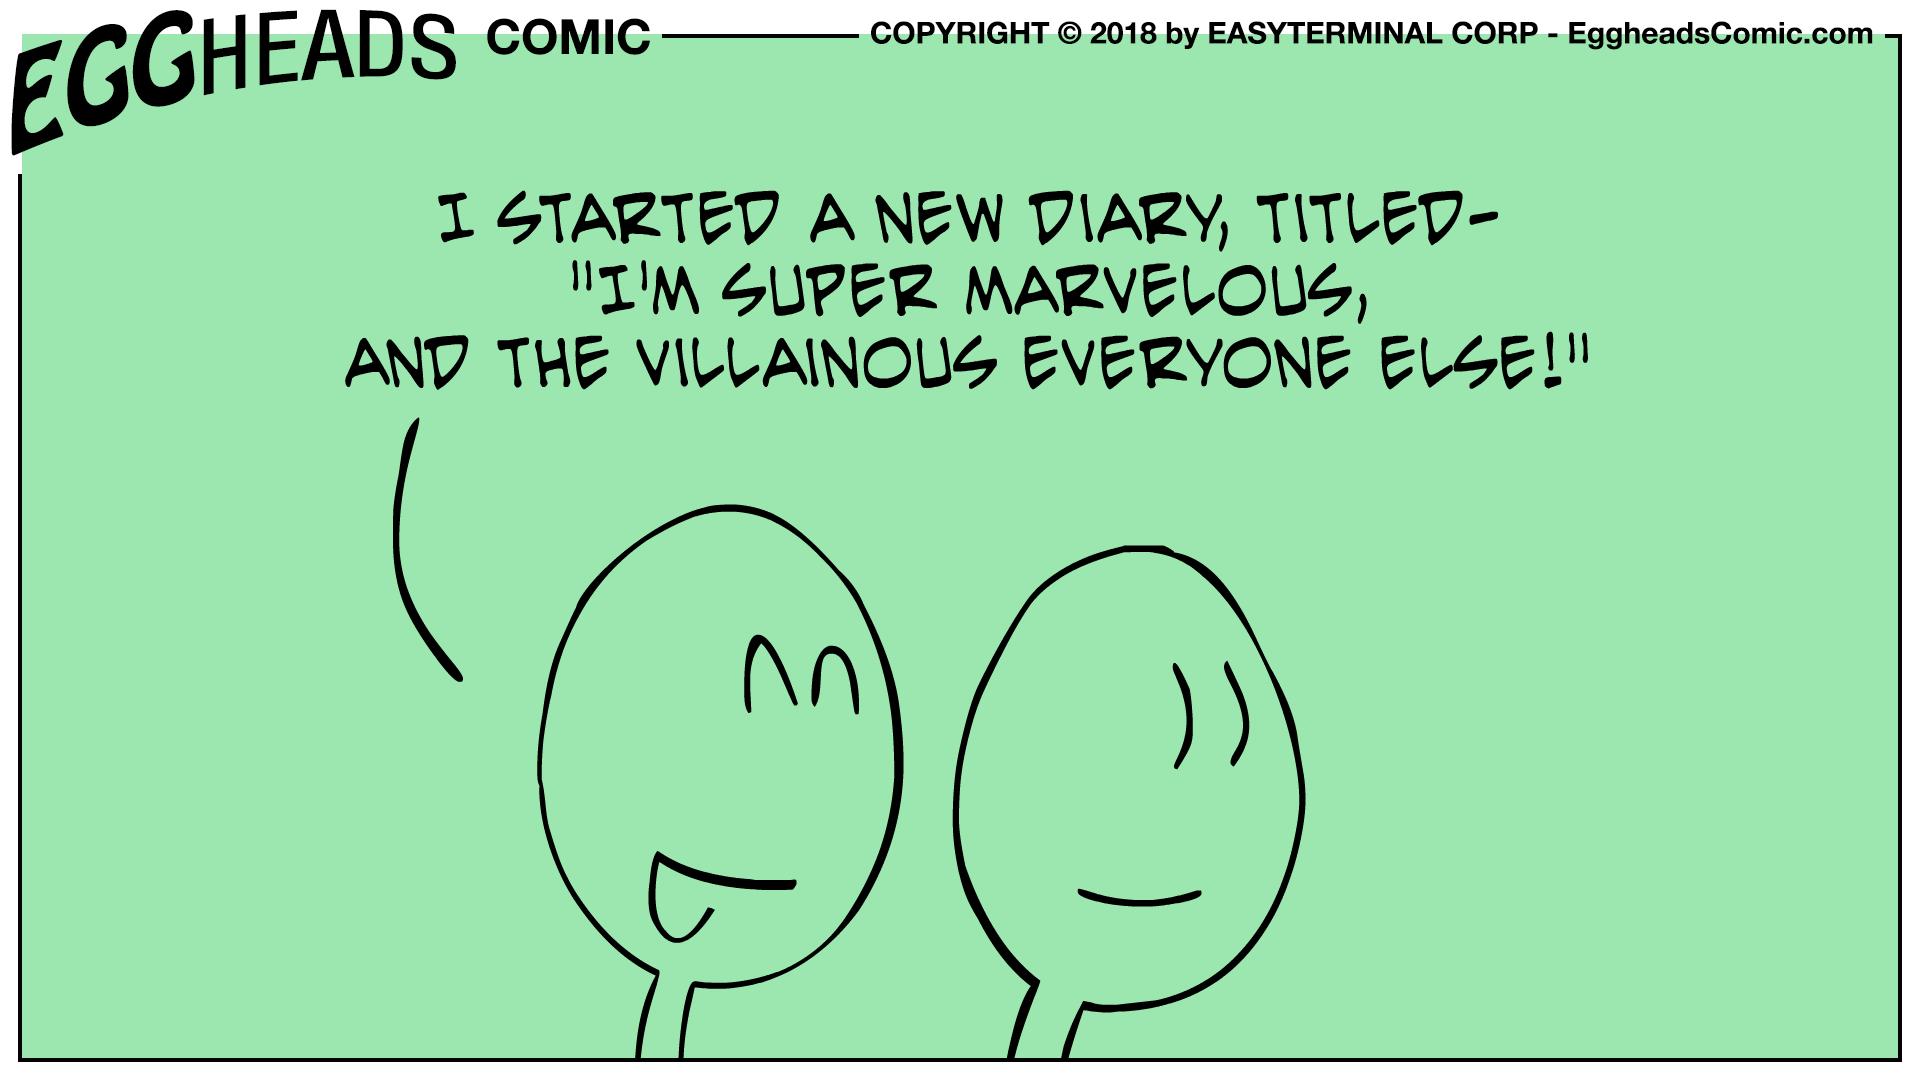 Webcomic Eggheads Comic Strip 096 New Diary